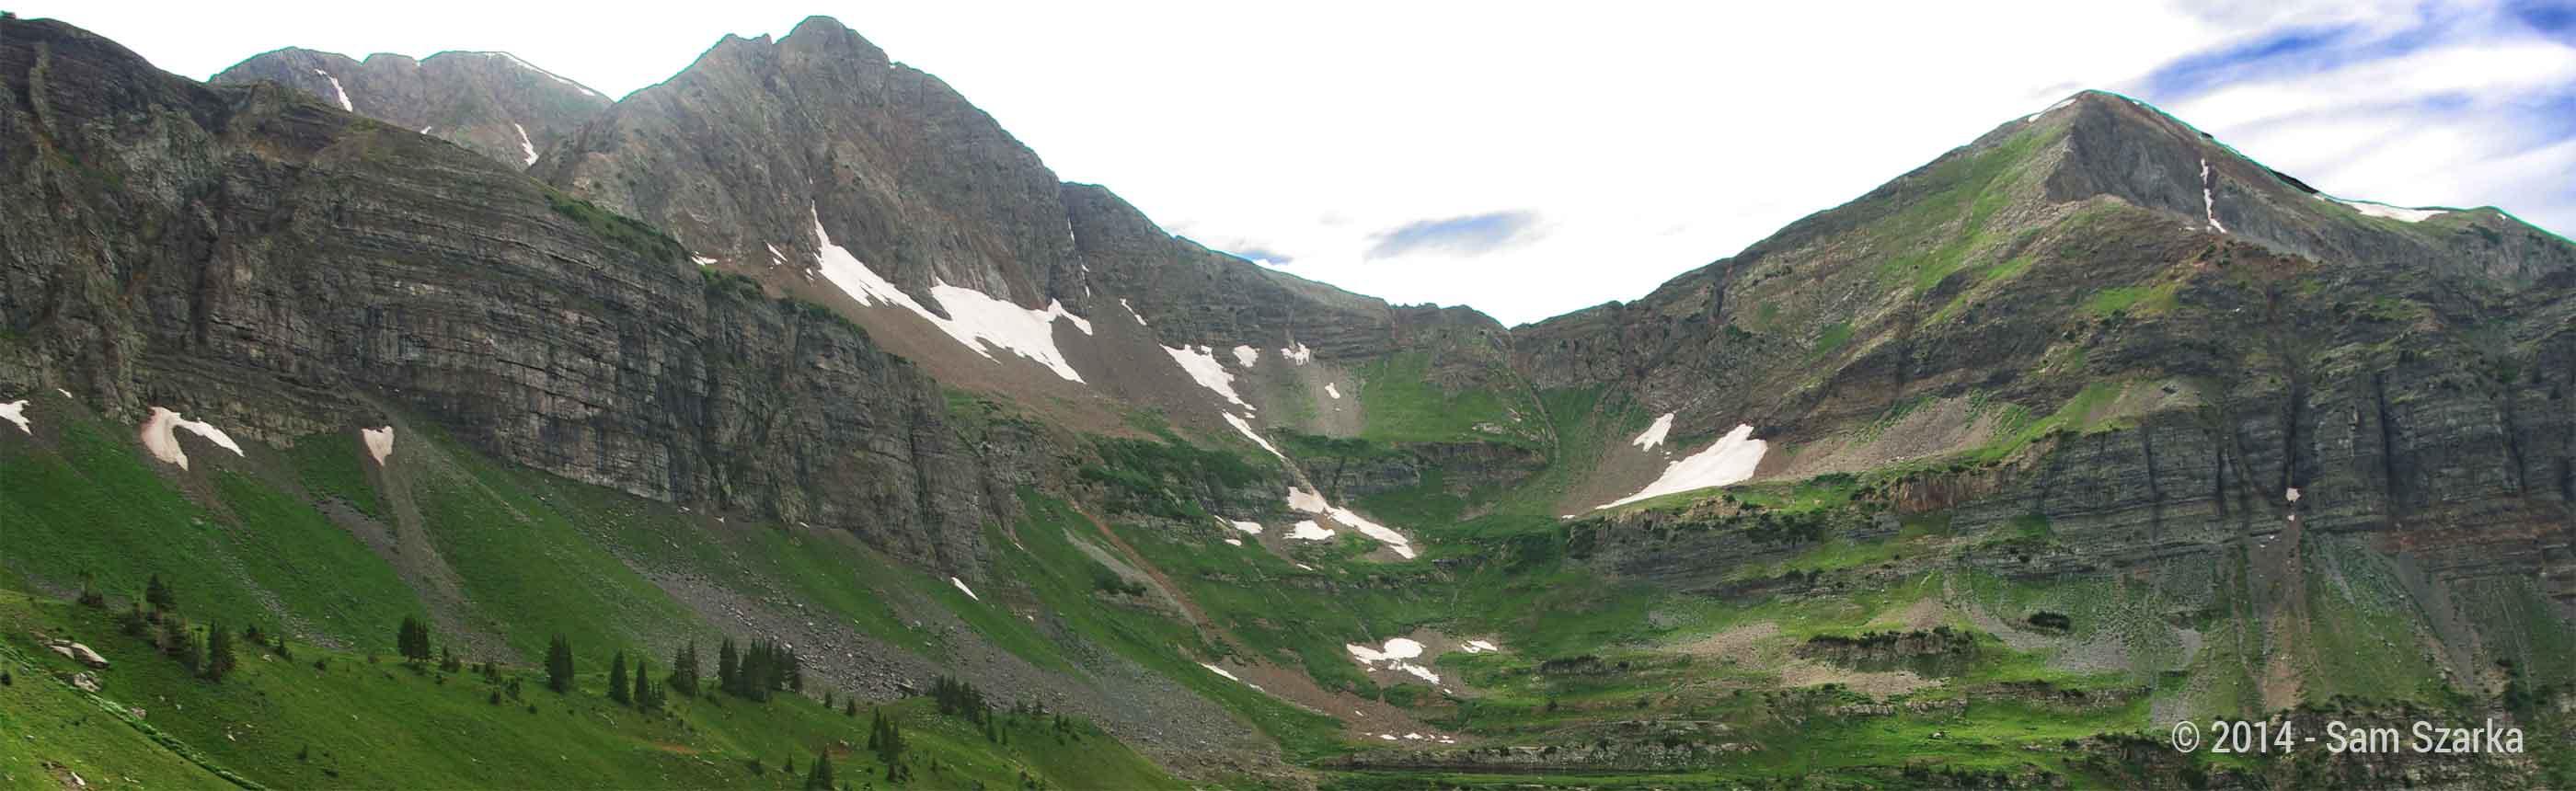 Raggeds Wilderness Colorado S Wild Areas